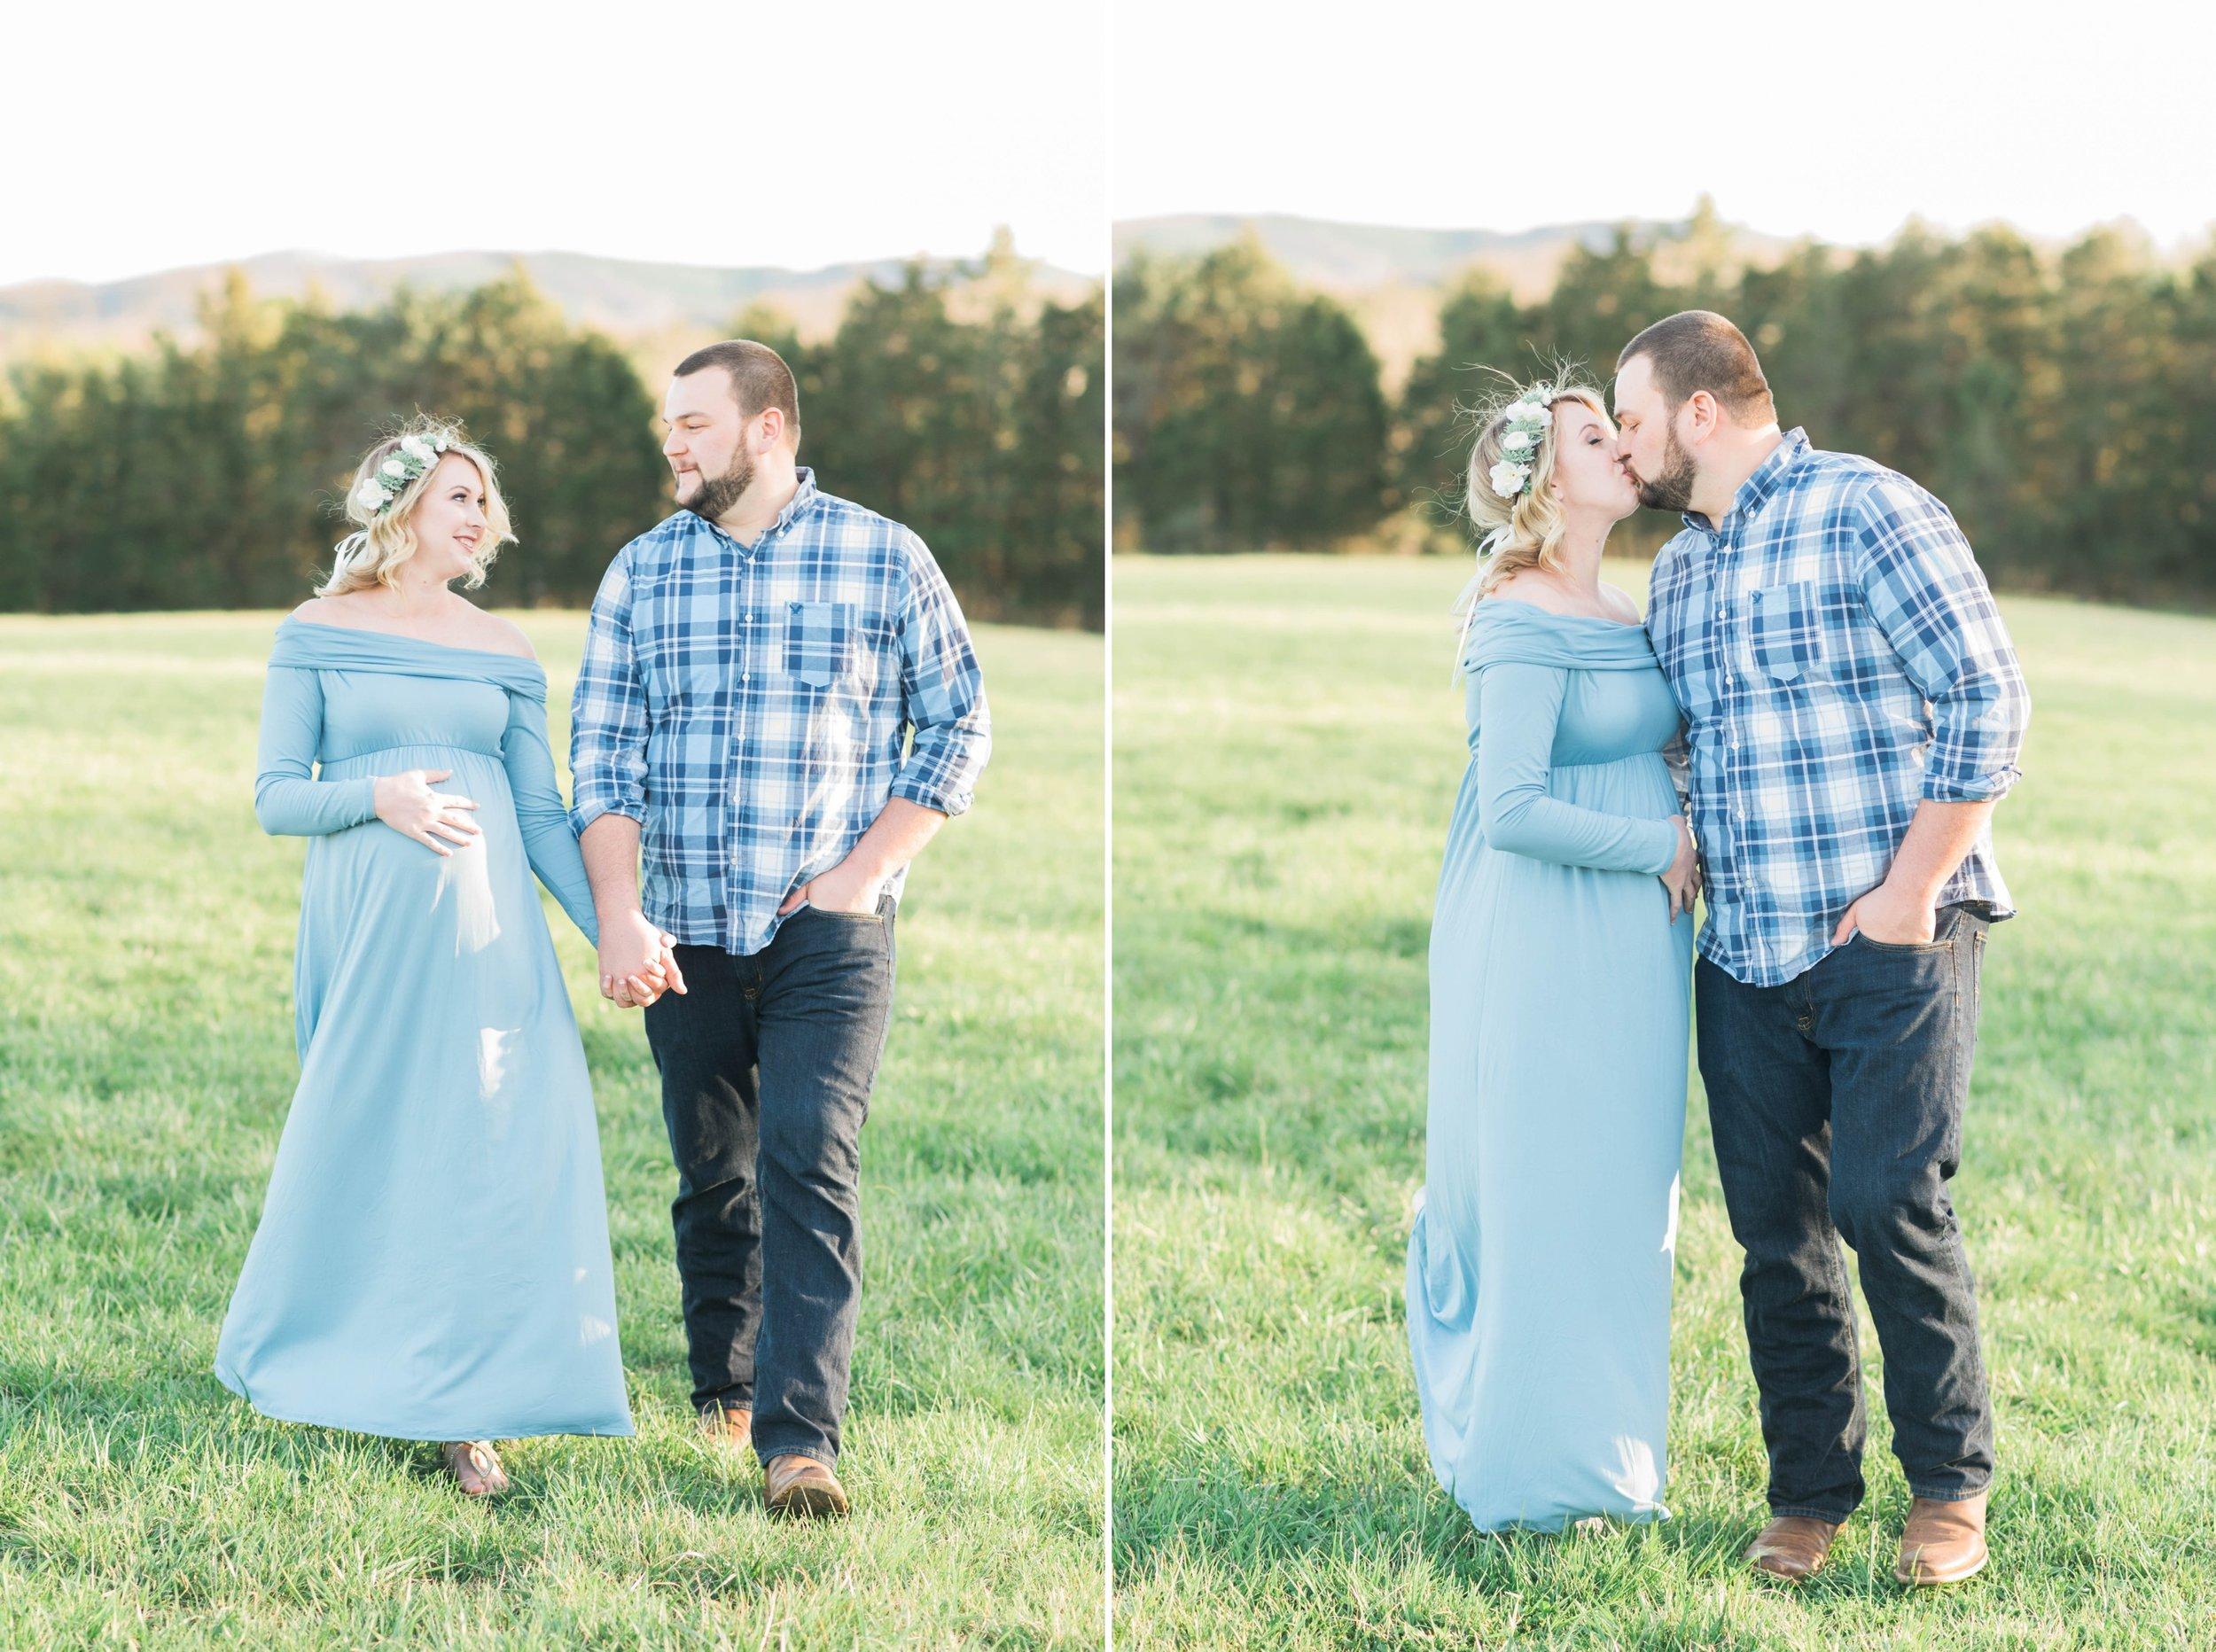 SorellaFarms_Jessica+Dylan_MaternitySession_Virginiaweddingphotographer 34.jpg